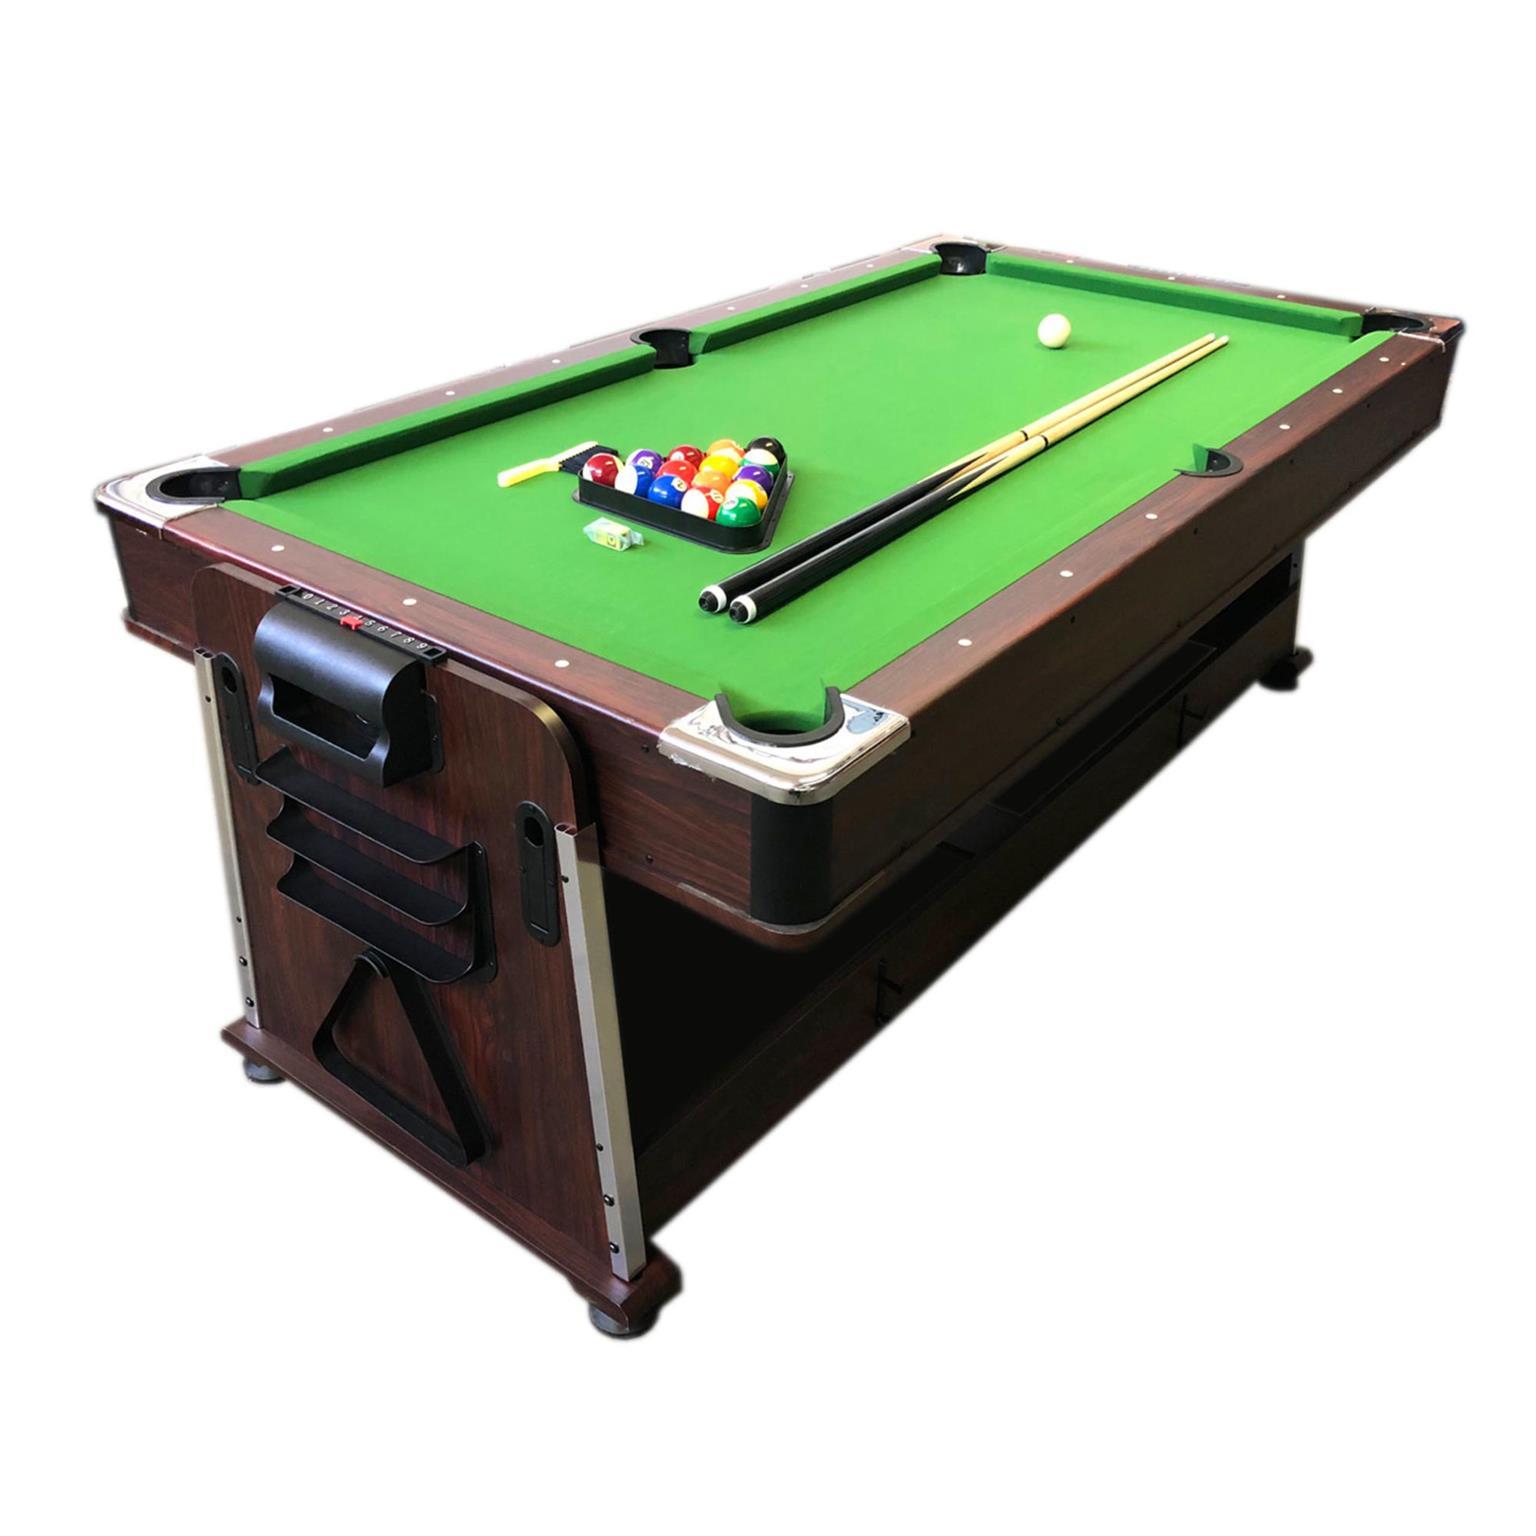 4 in 1 - 7Ft Green Pool Table + Air Hockey + Tennis Table Tennis + Dinner table